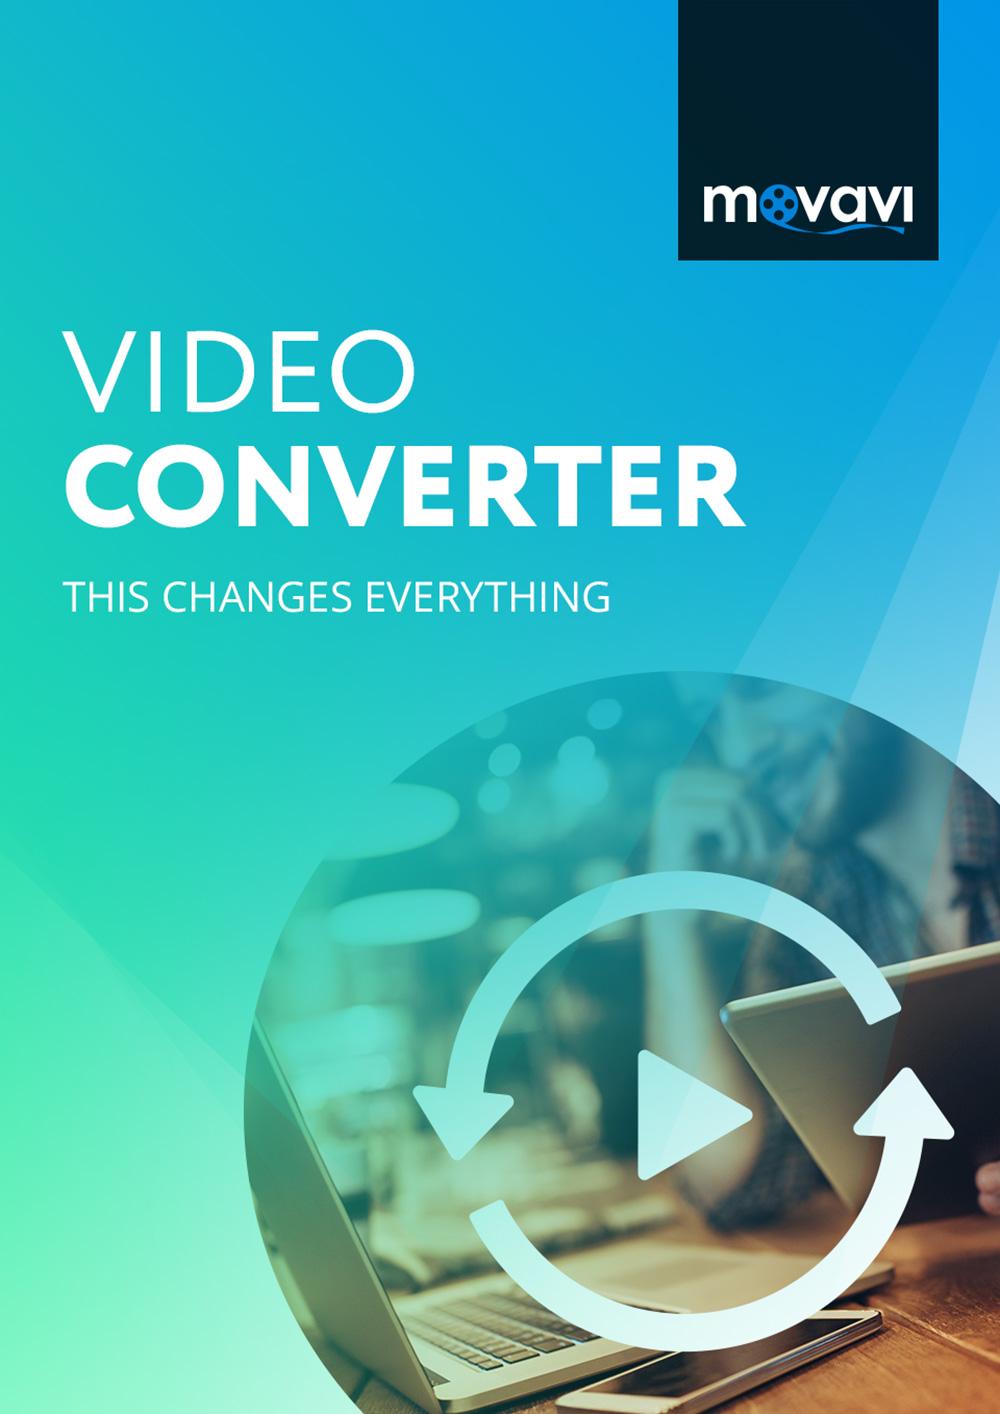 Movavi Video Converter 18 Personal Edition [Download] by Movavi